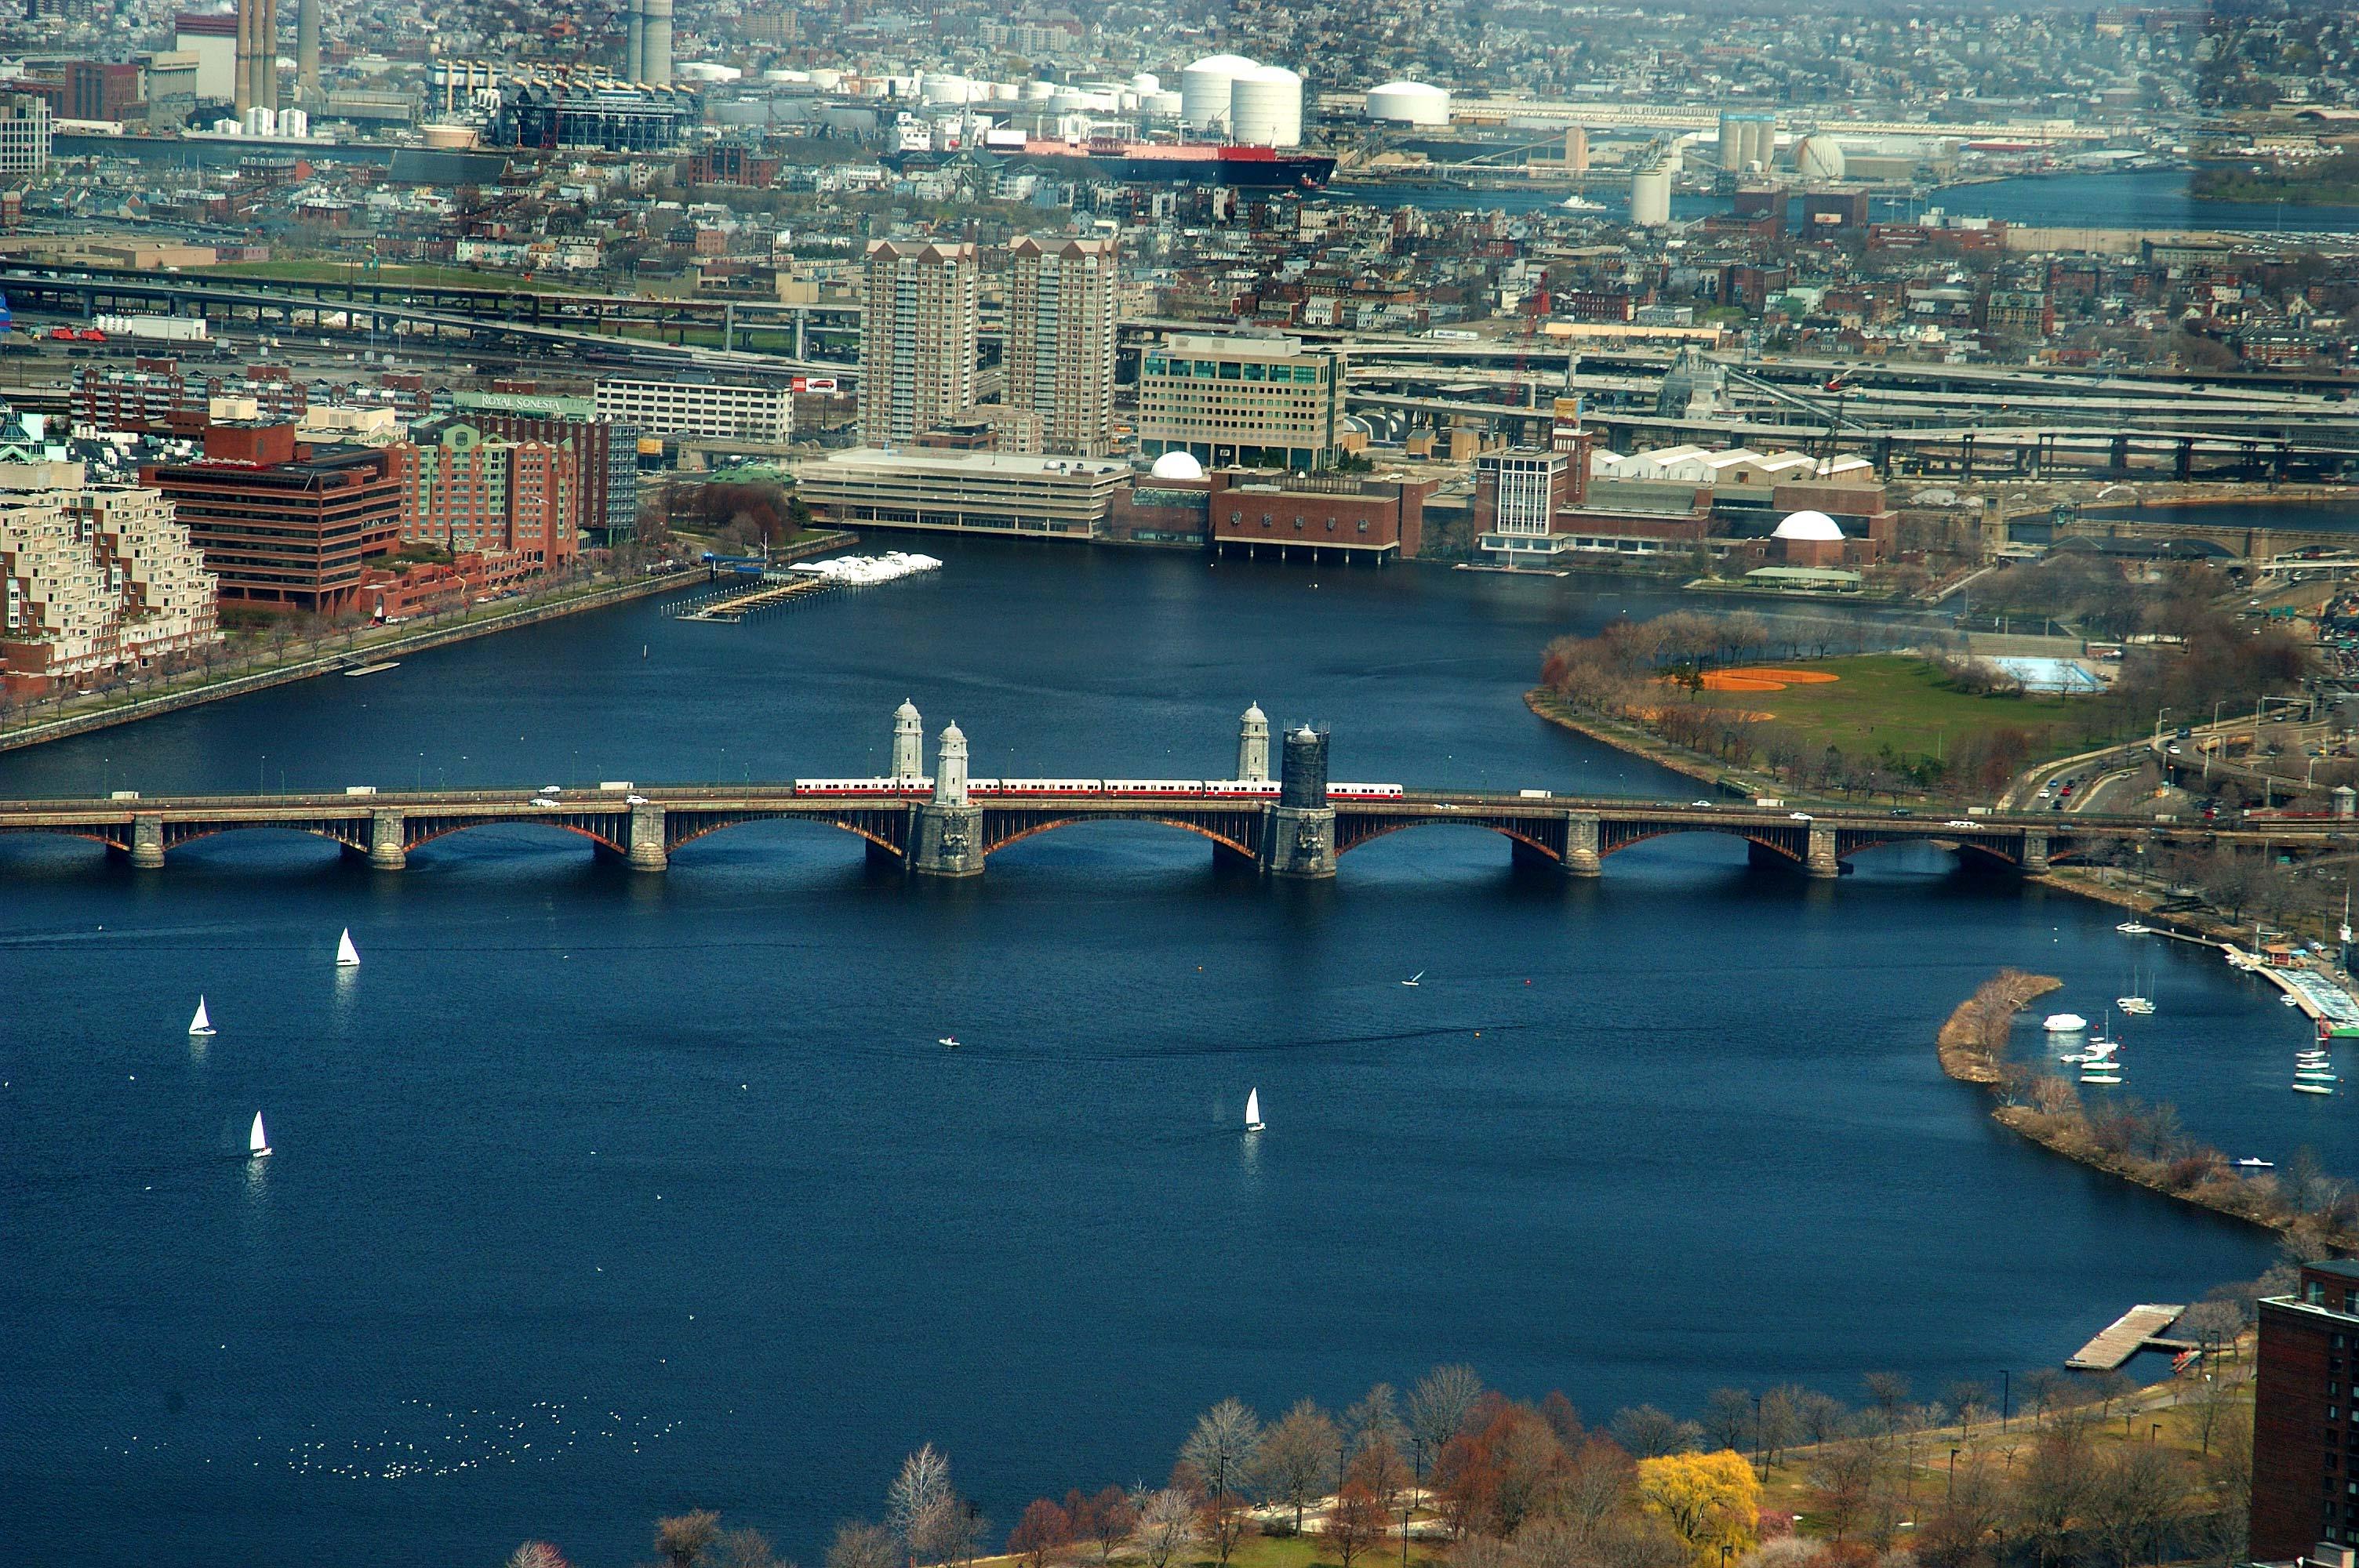 Fall New England Wallpaper Photo 337 12 Long Fellow Bridge Across Charles River From